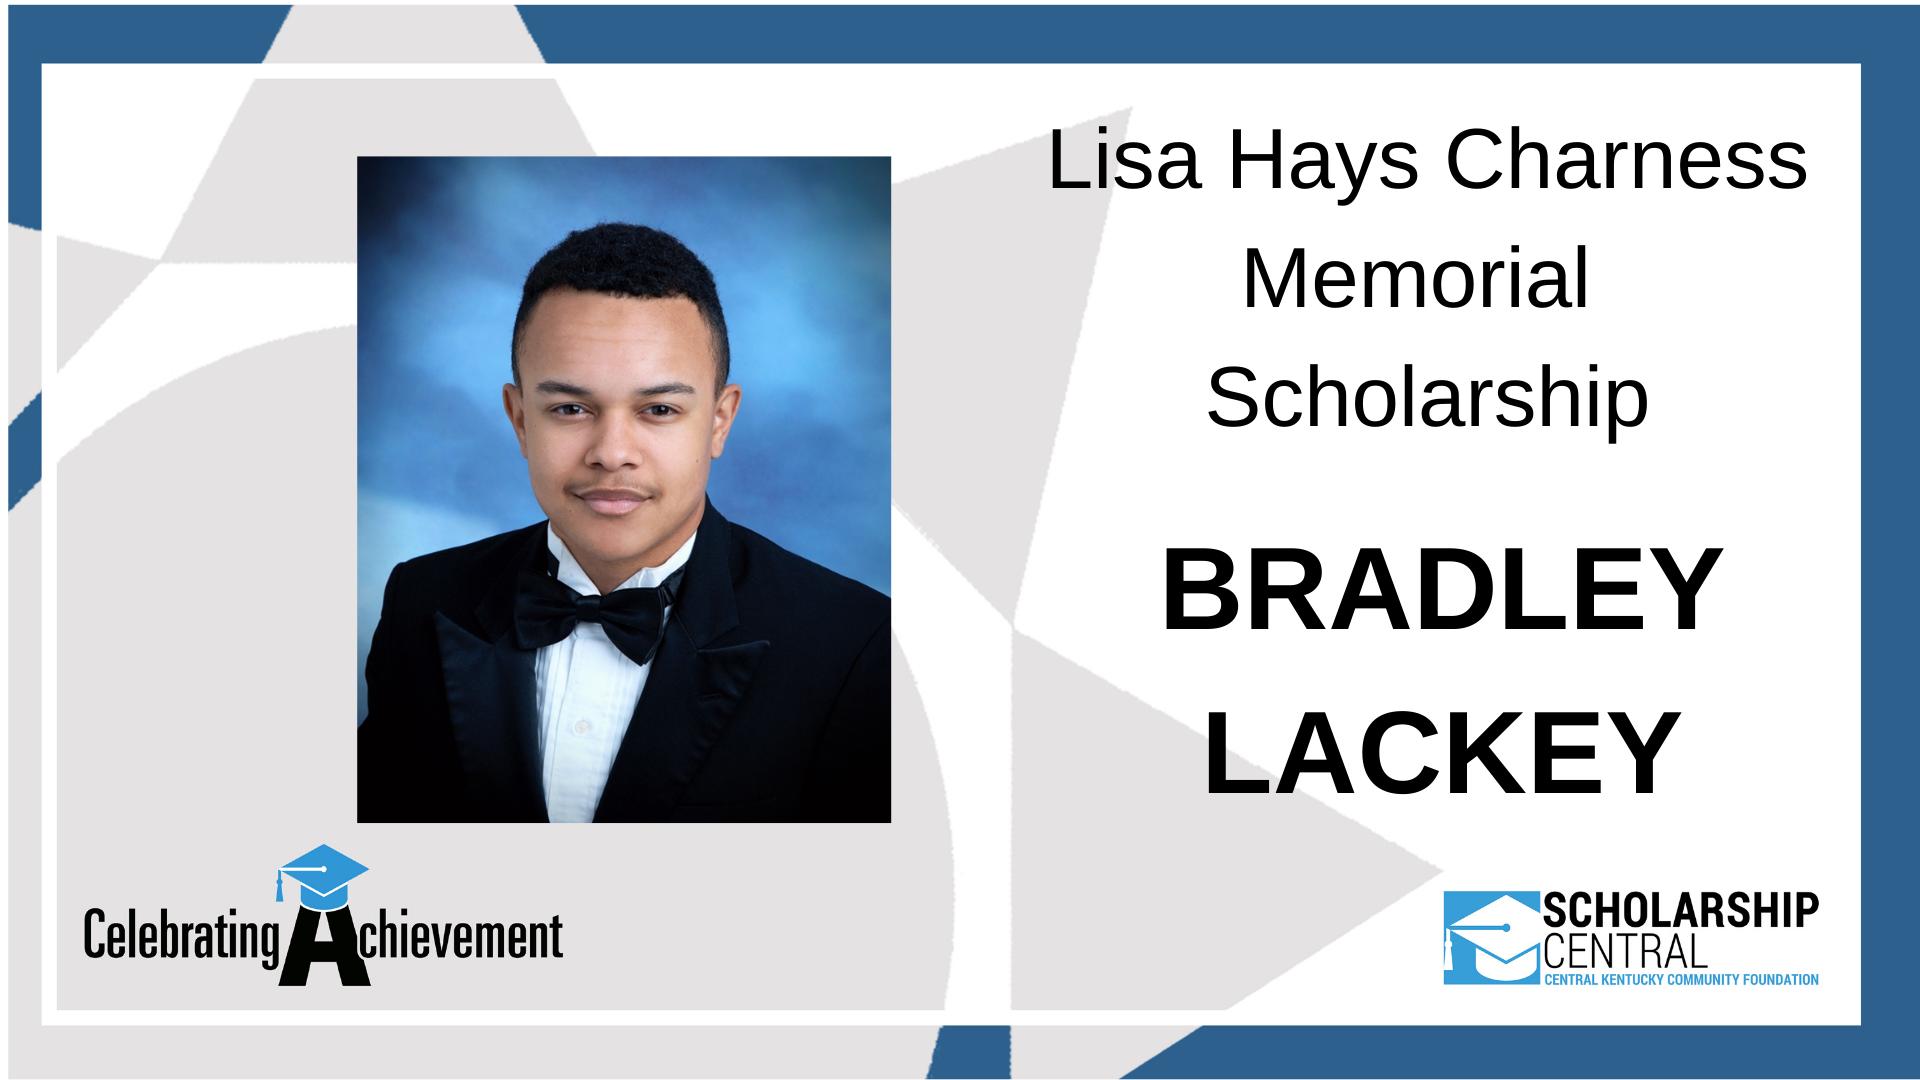 Lisa Hays Charness Scholarship